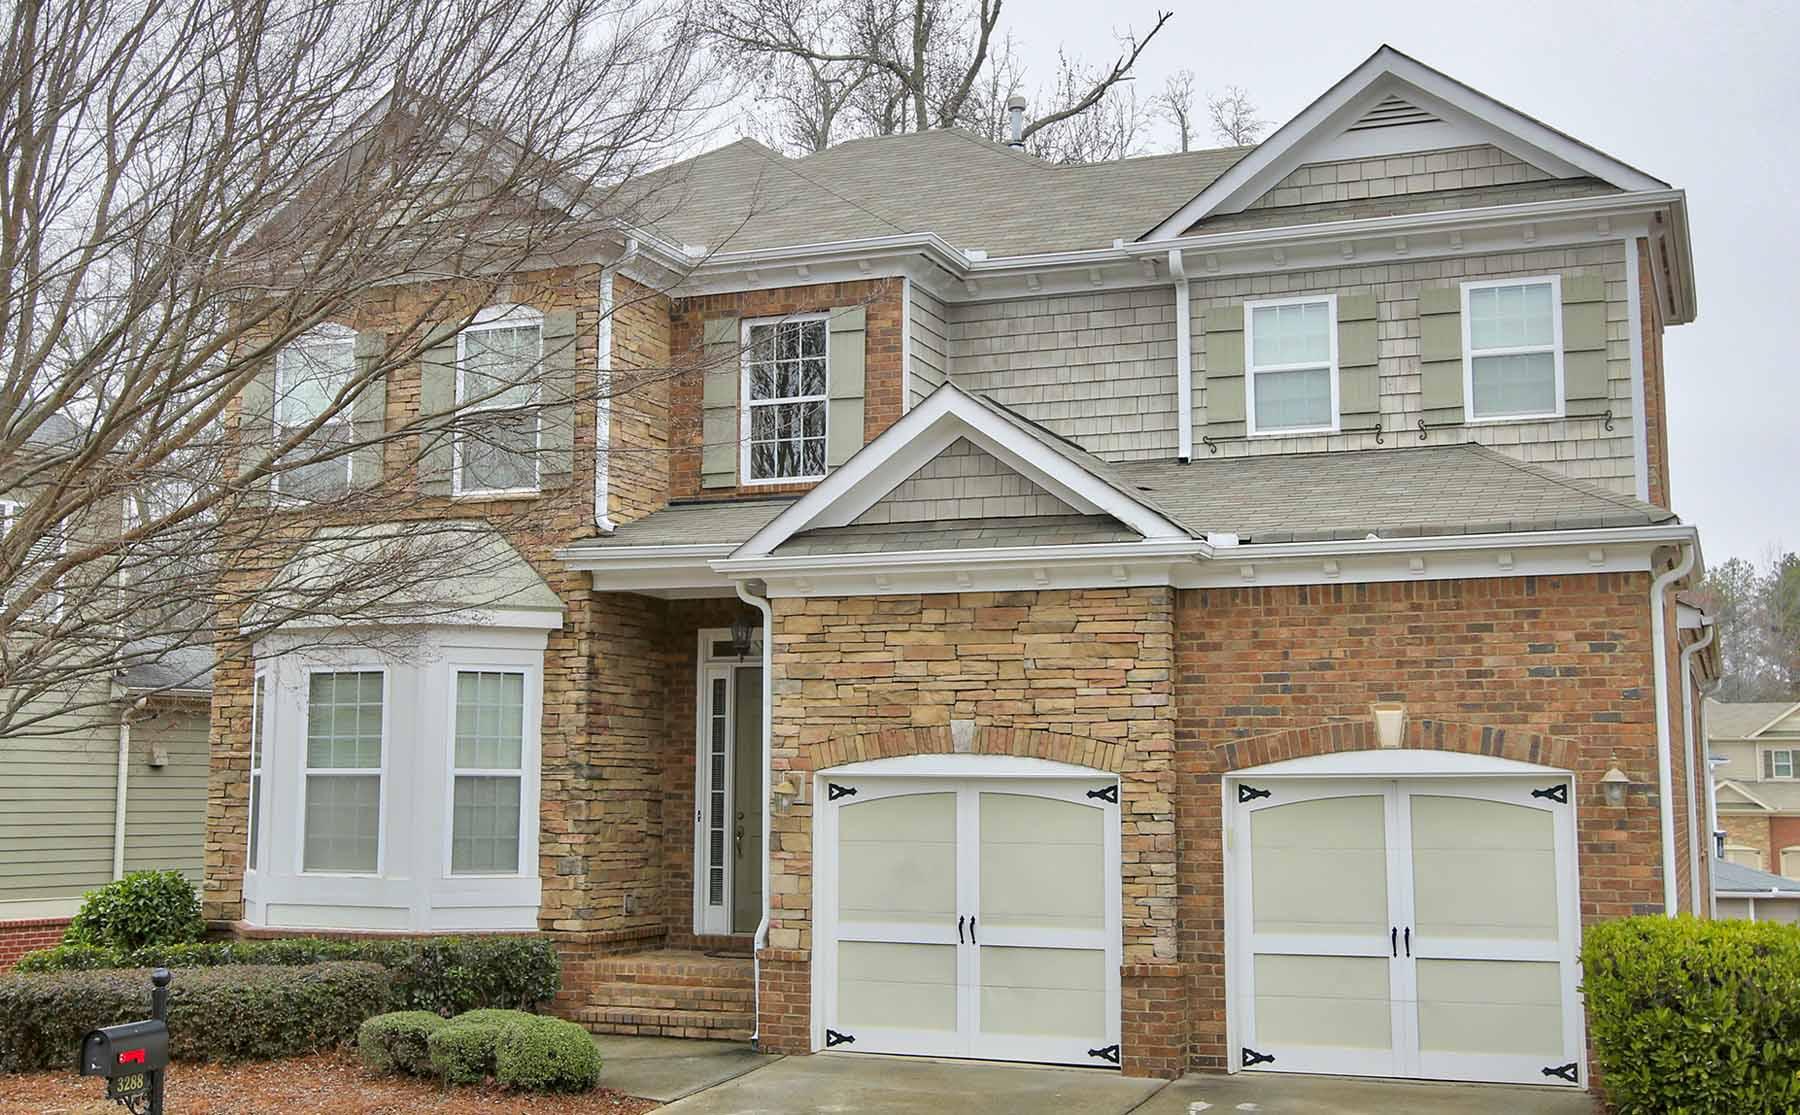 Nhà ở một gia đình vì Bán tại Immaculate Home in Crooked Creek 3288 Kentworth Lane Alpharetta, Georgia, 30004 Hoa Kỳ